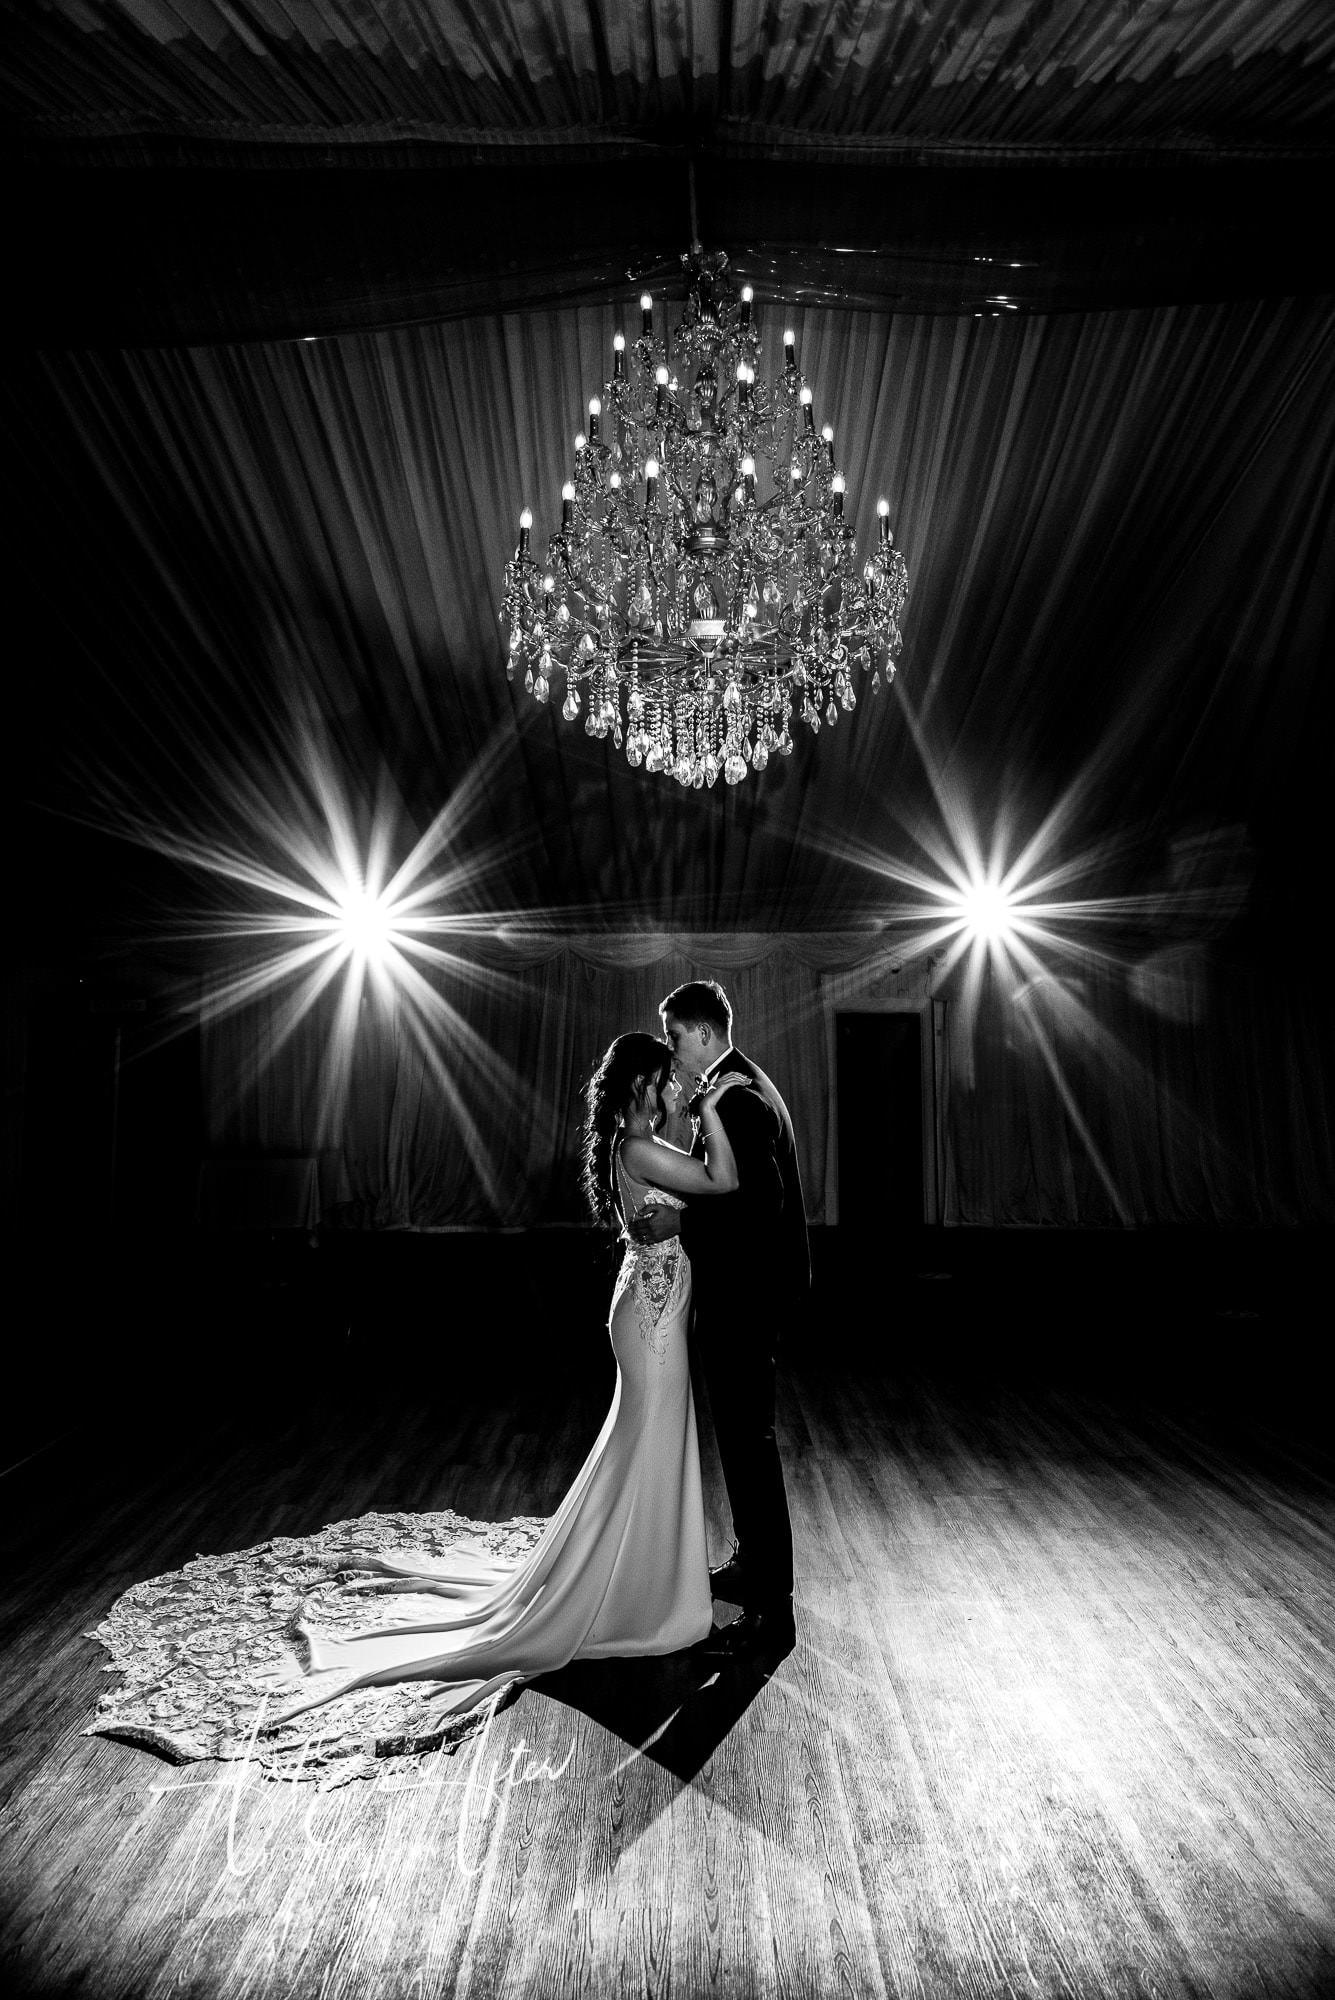 Durham Wedding Photographer, first wedding dance, bride and groom